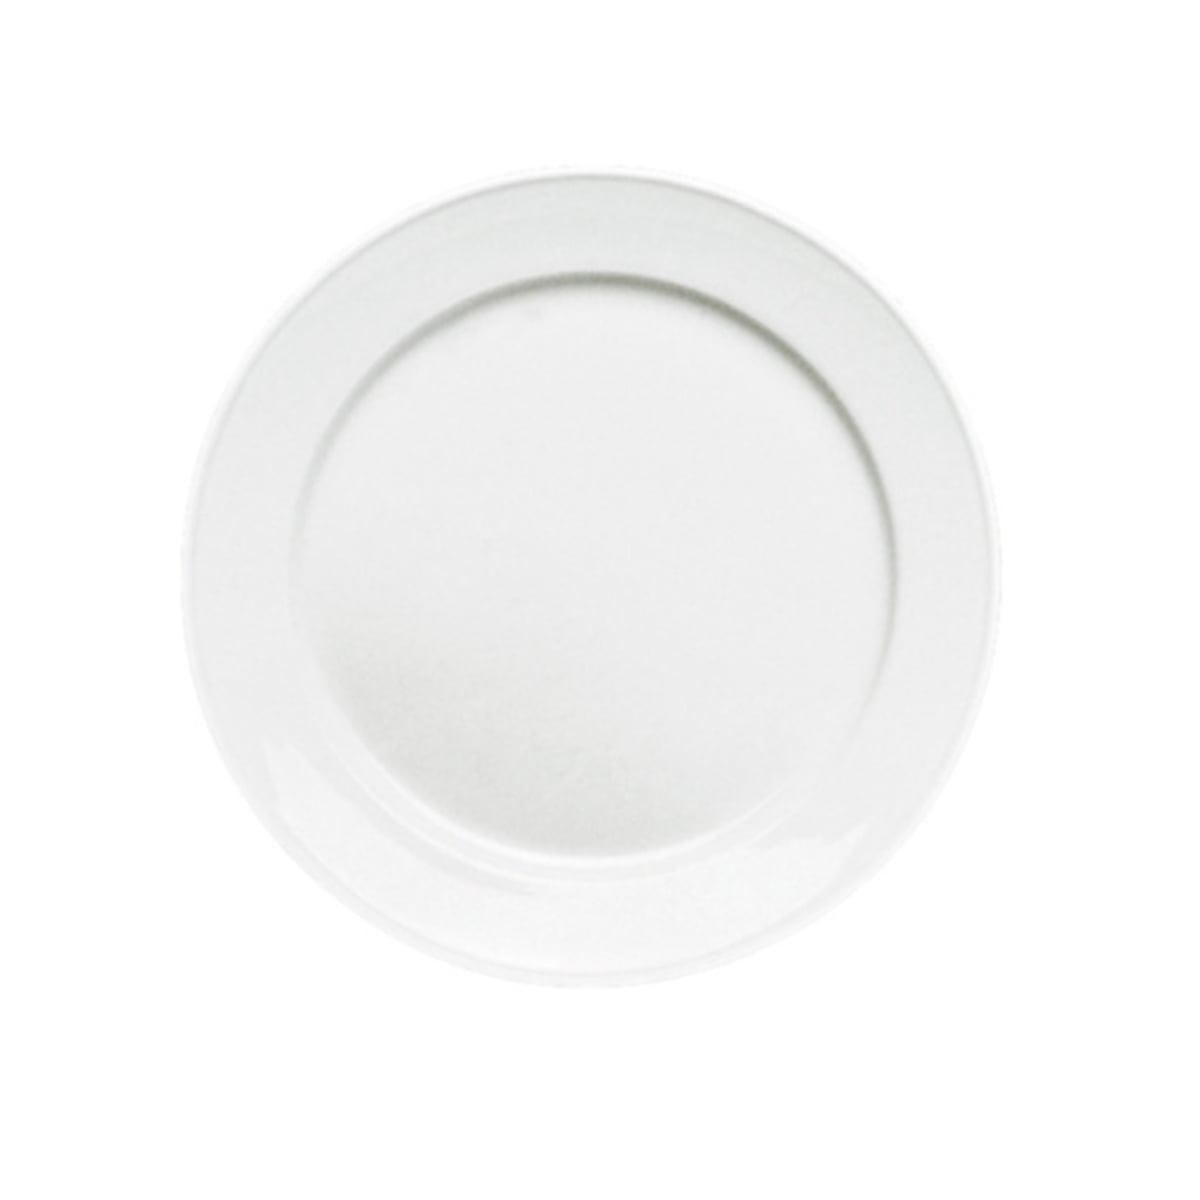 Wagenfeld - Frühstücksteller Ø 21 cm, weiß